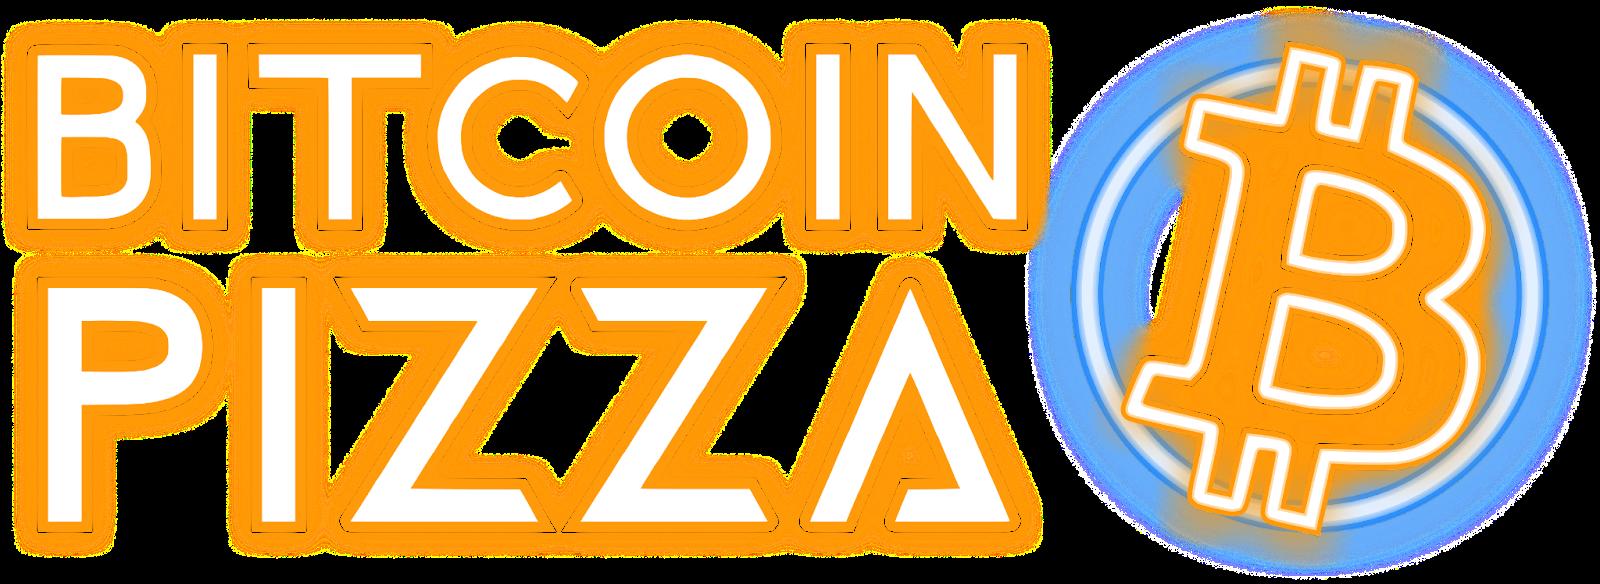 bitcoin pizza business